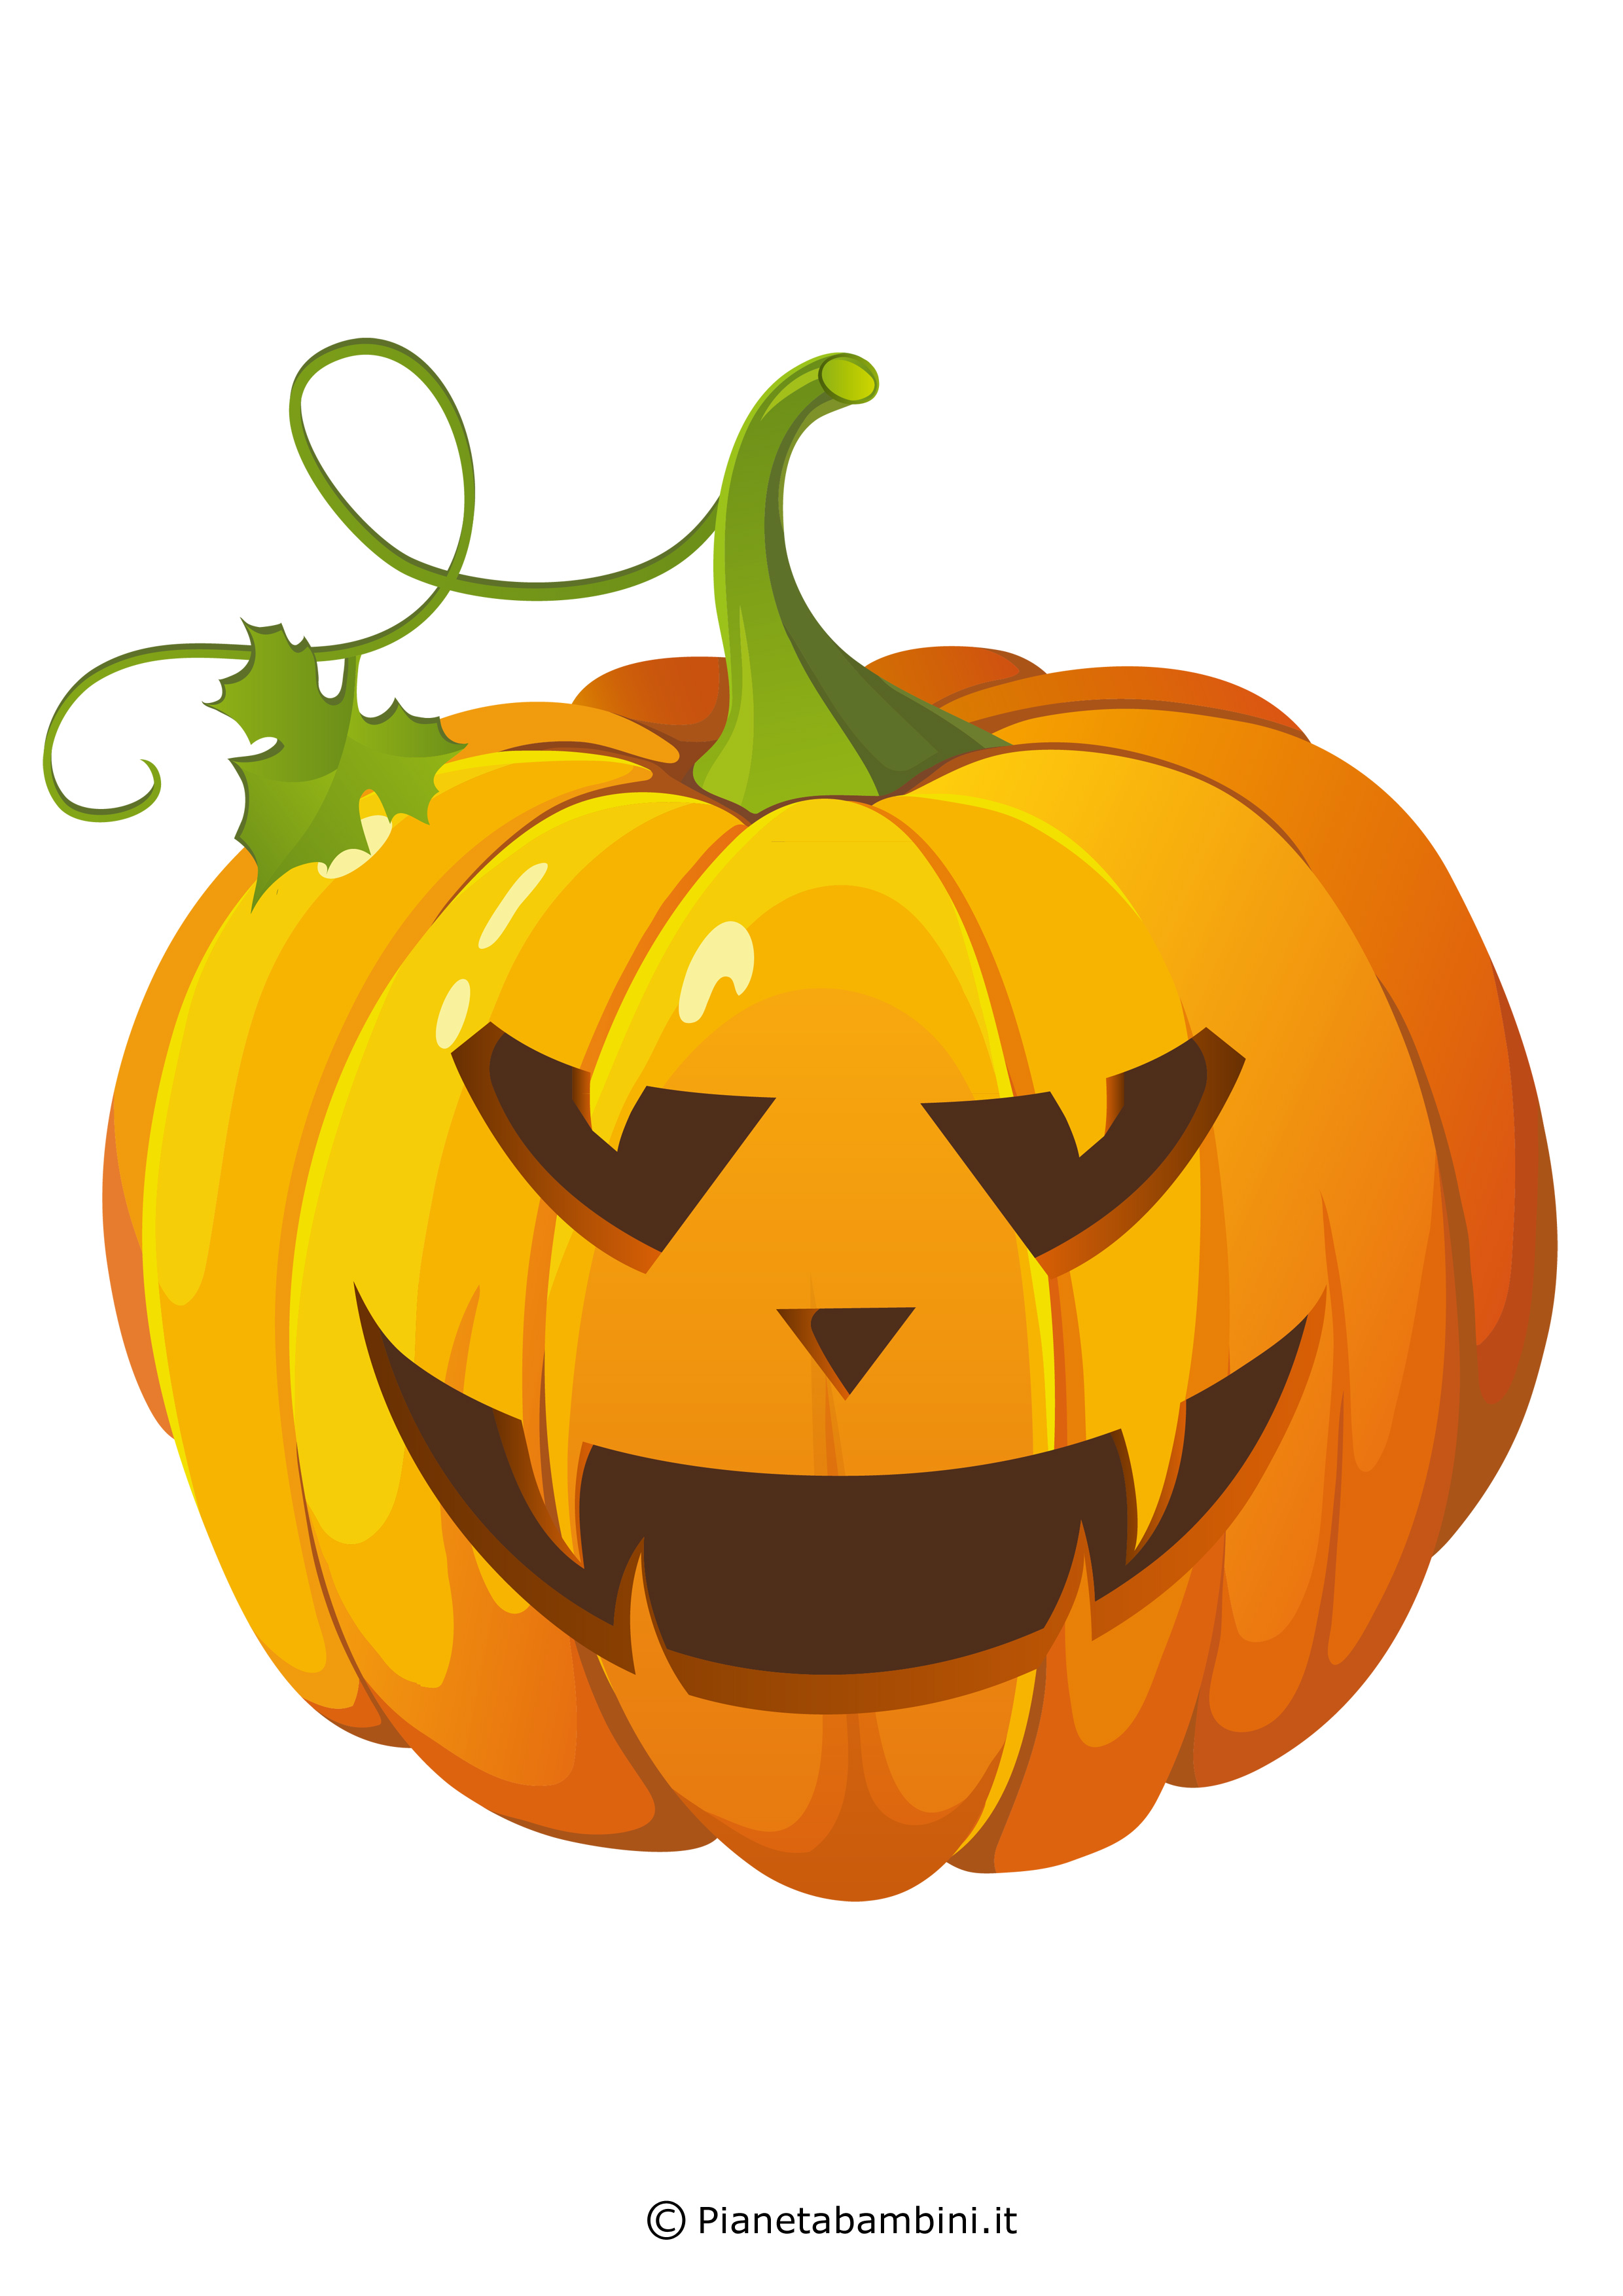 Zucche Di Halloween Cartoni Animati.Immagini Di Zucche Di Halloween Da Stampare E Ritagliare